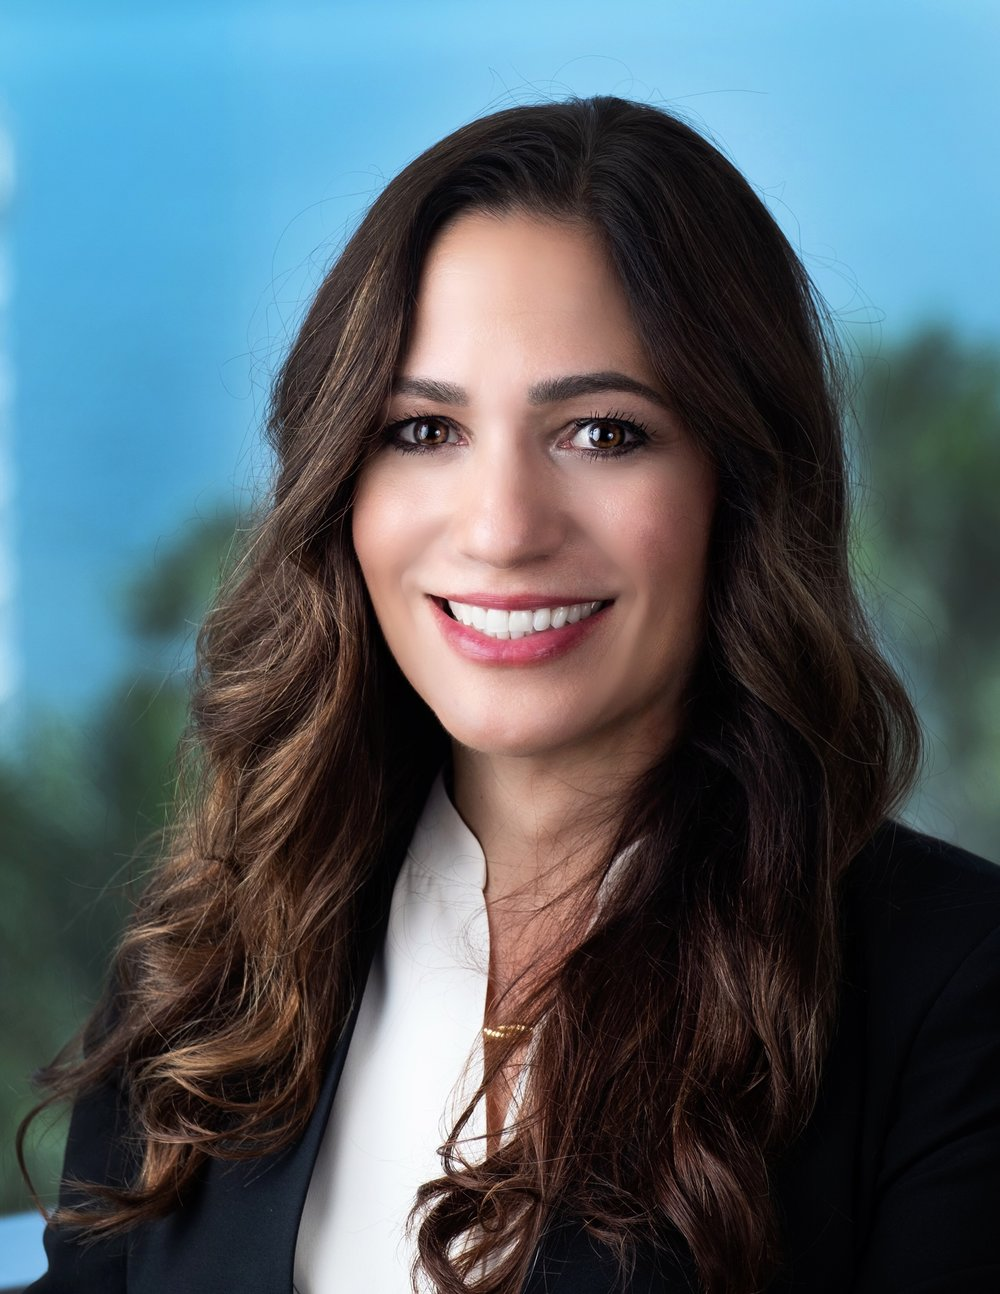 Darlene Barron, Esq. - U.S. Registered Patent Attorney